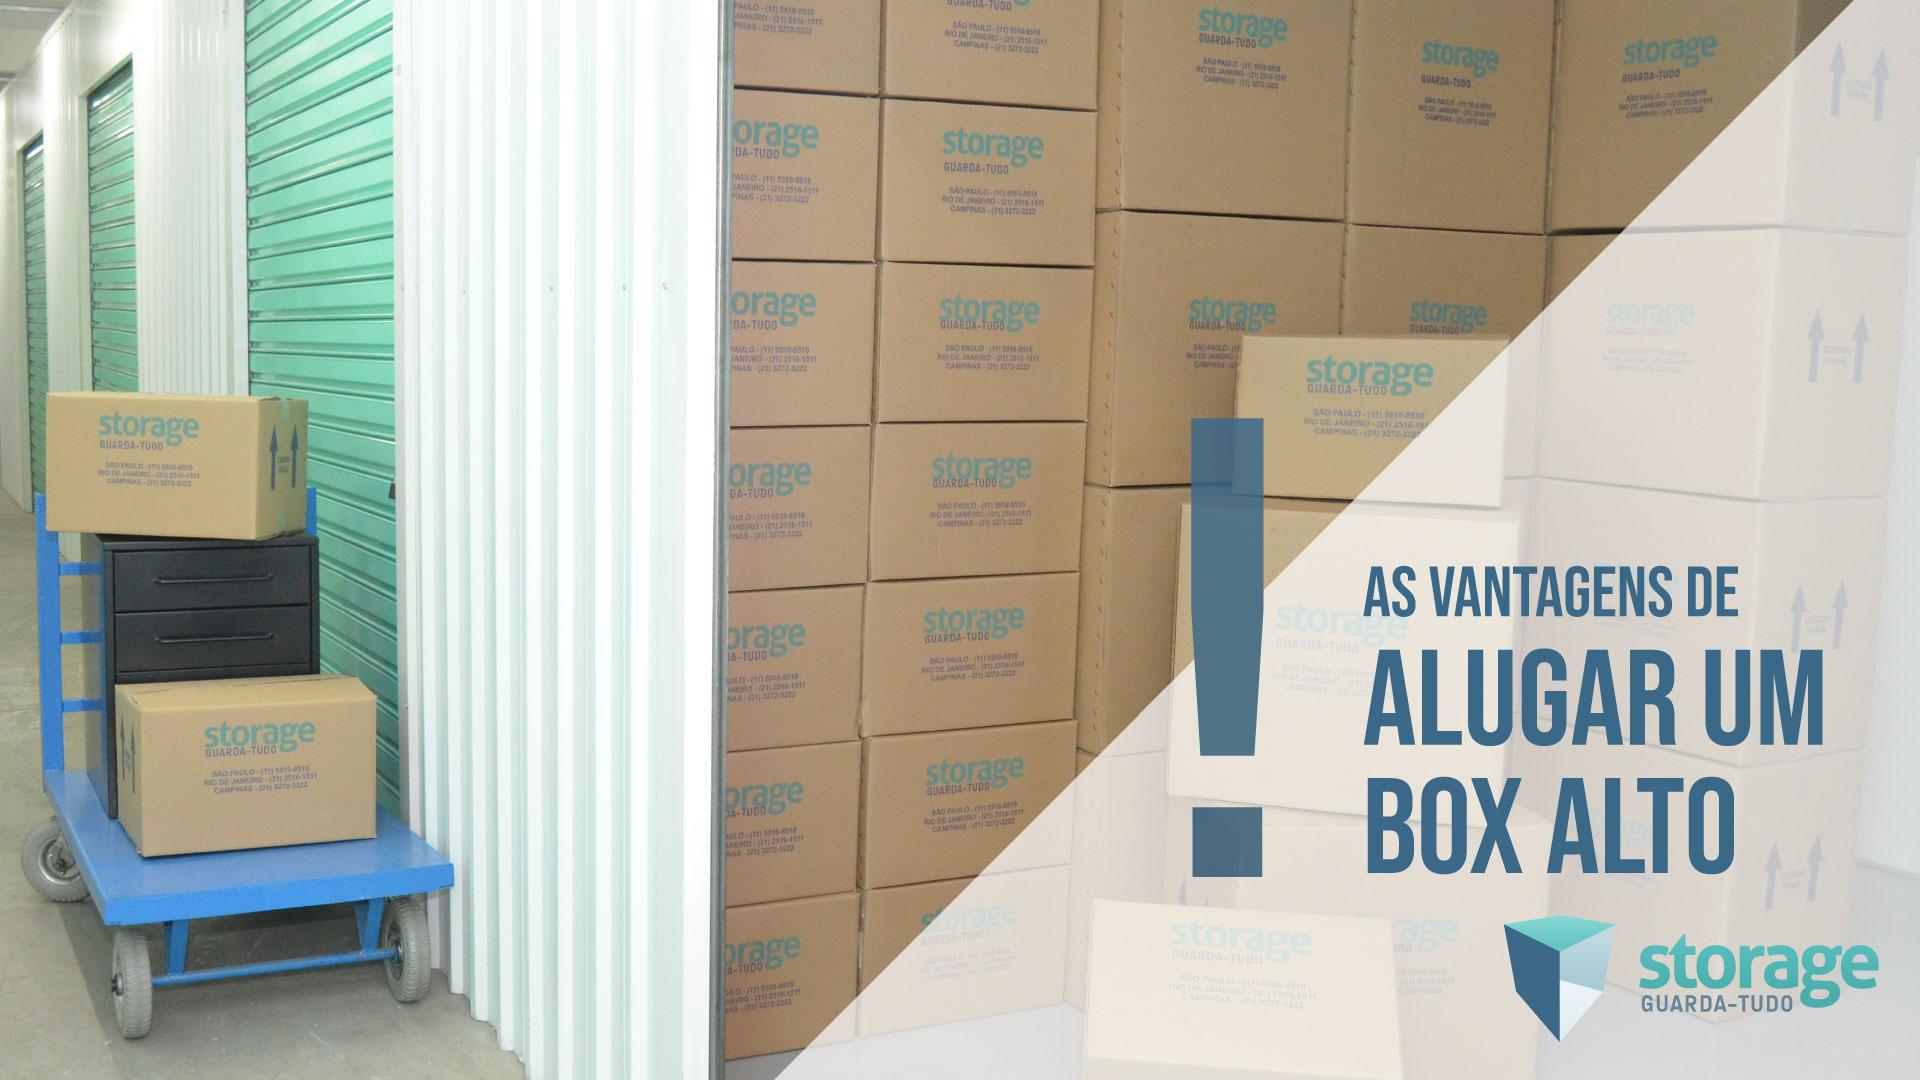 Box-alto-self-storage